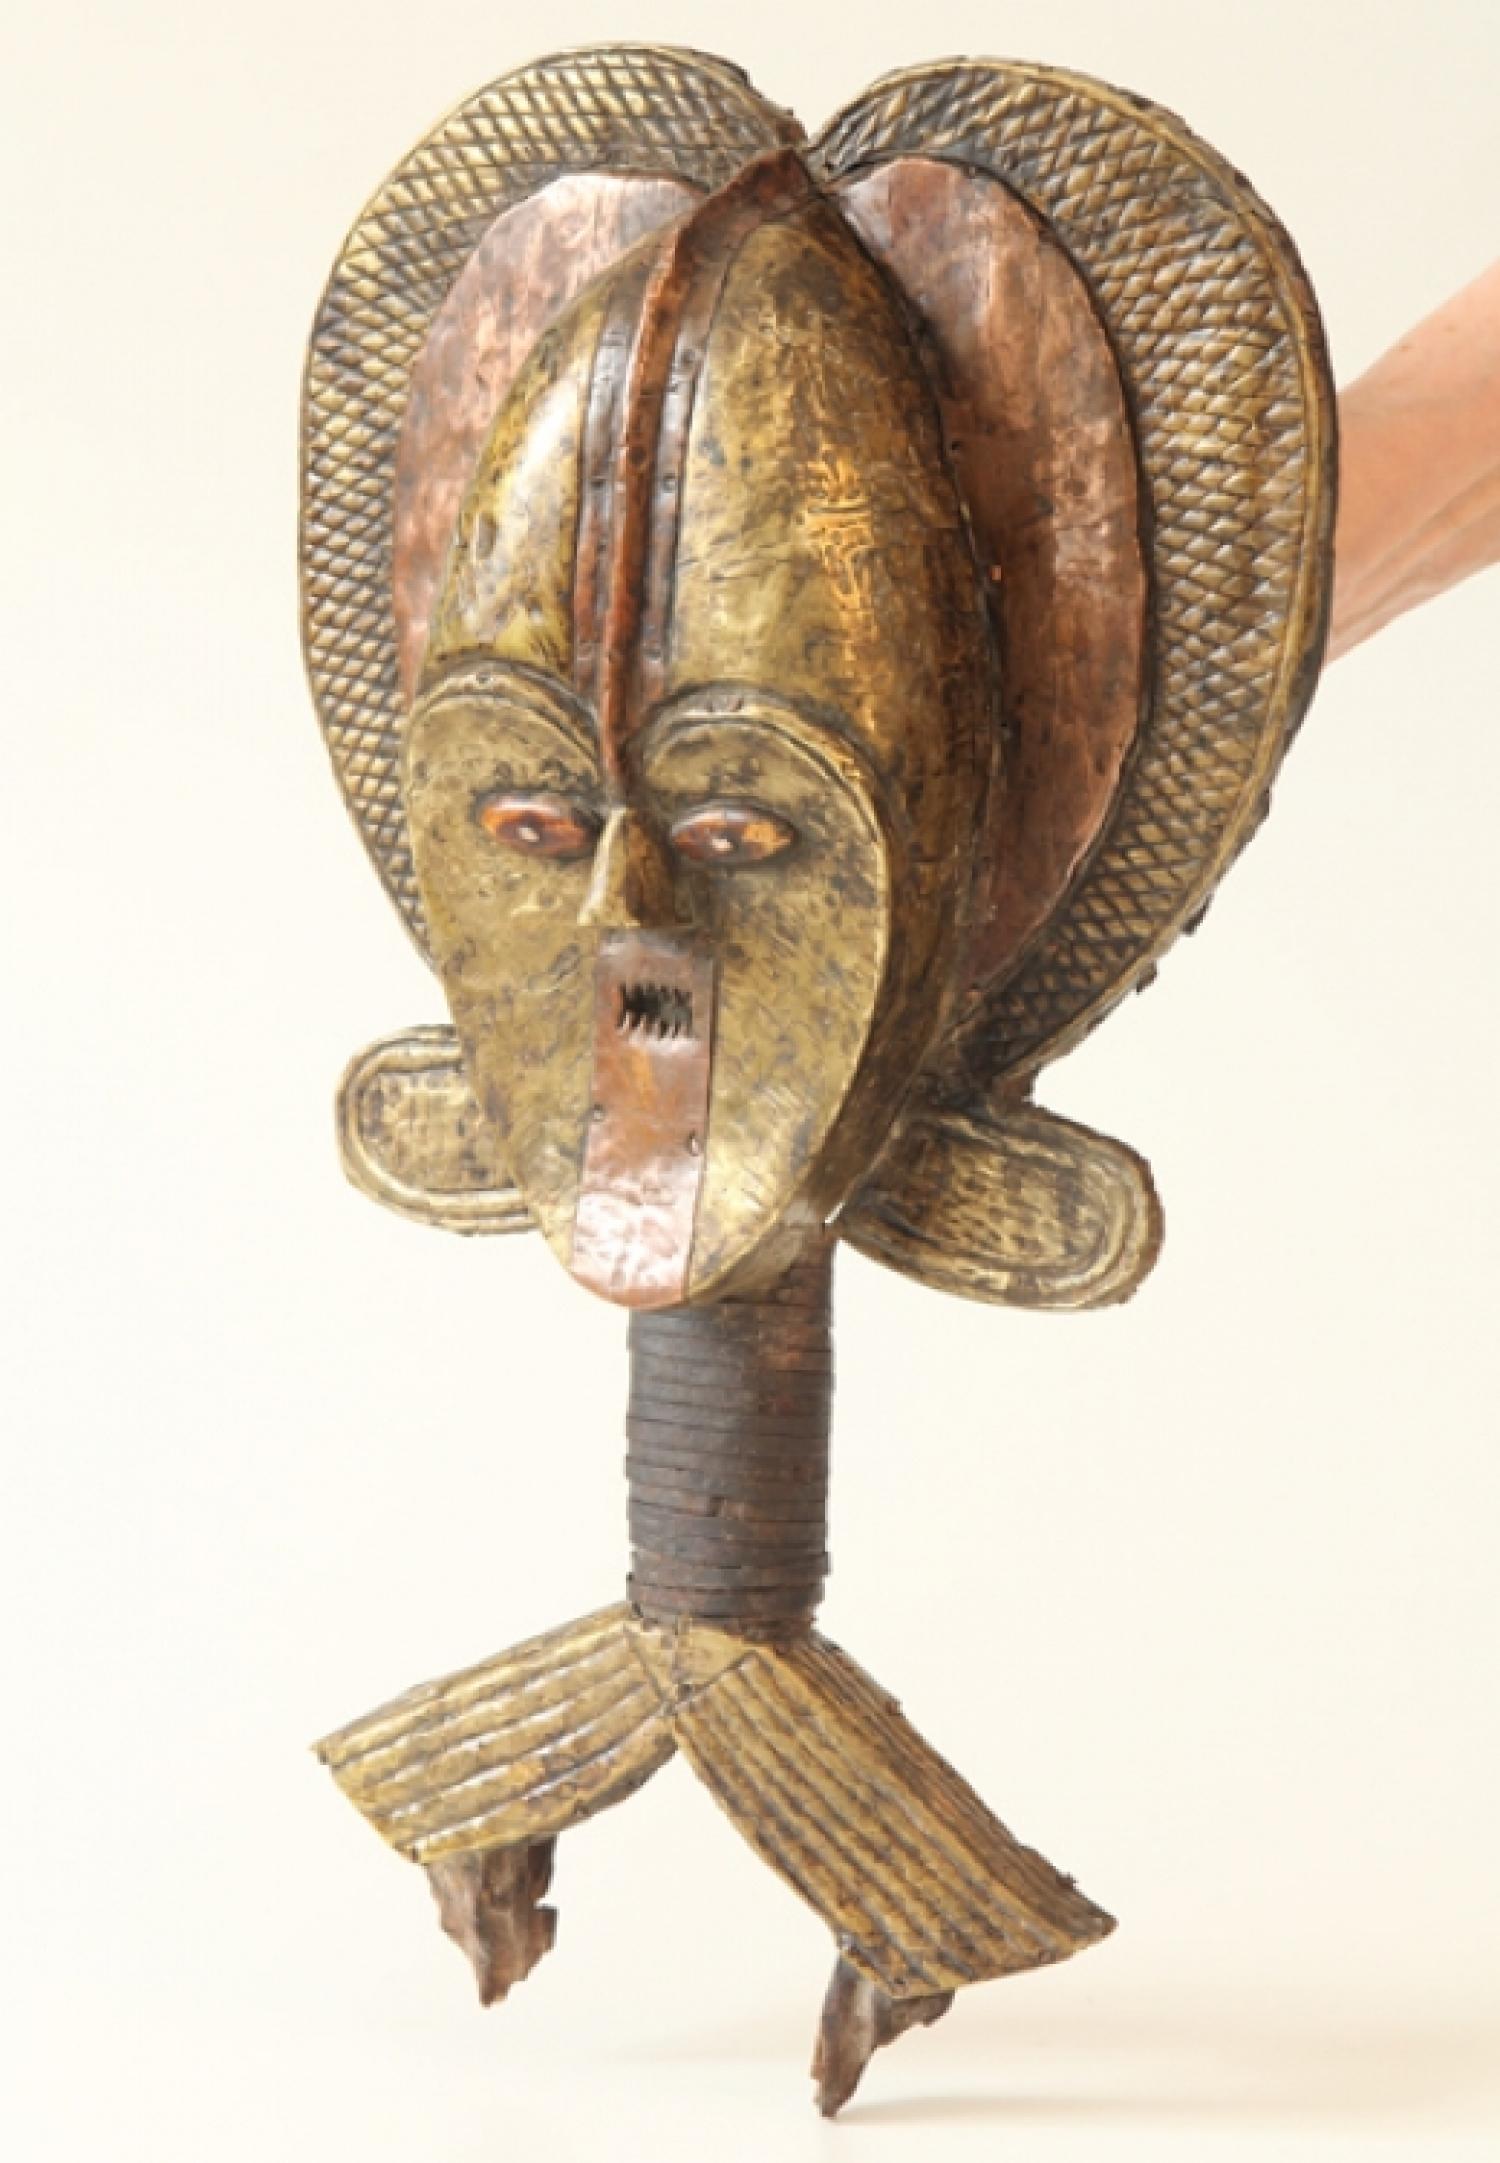 reliquary guardian figure Female reliquary guardian figure, ca 1850, cameroon or gabon, west africa, pm 30-2-50/b4973.